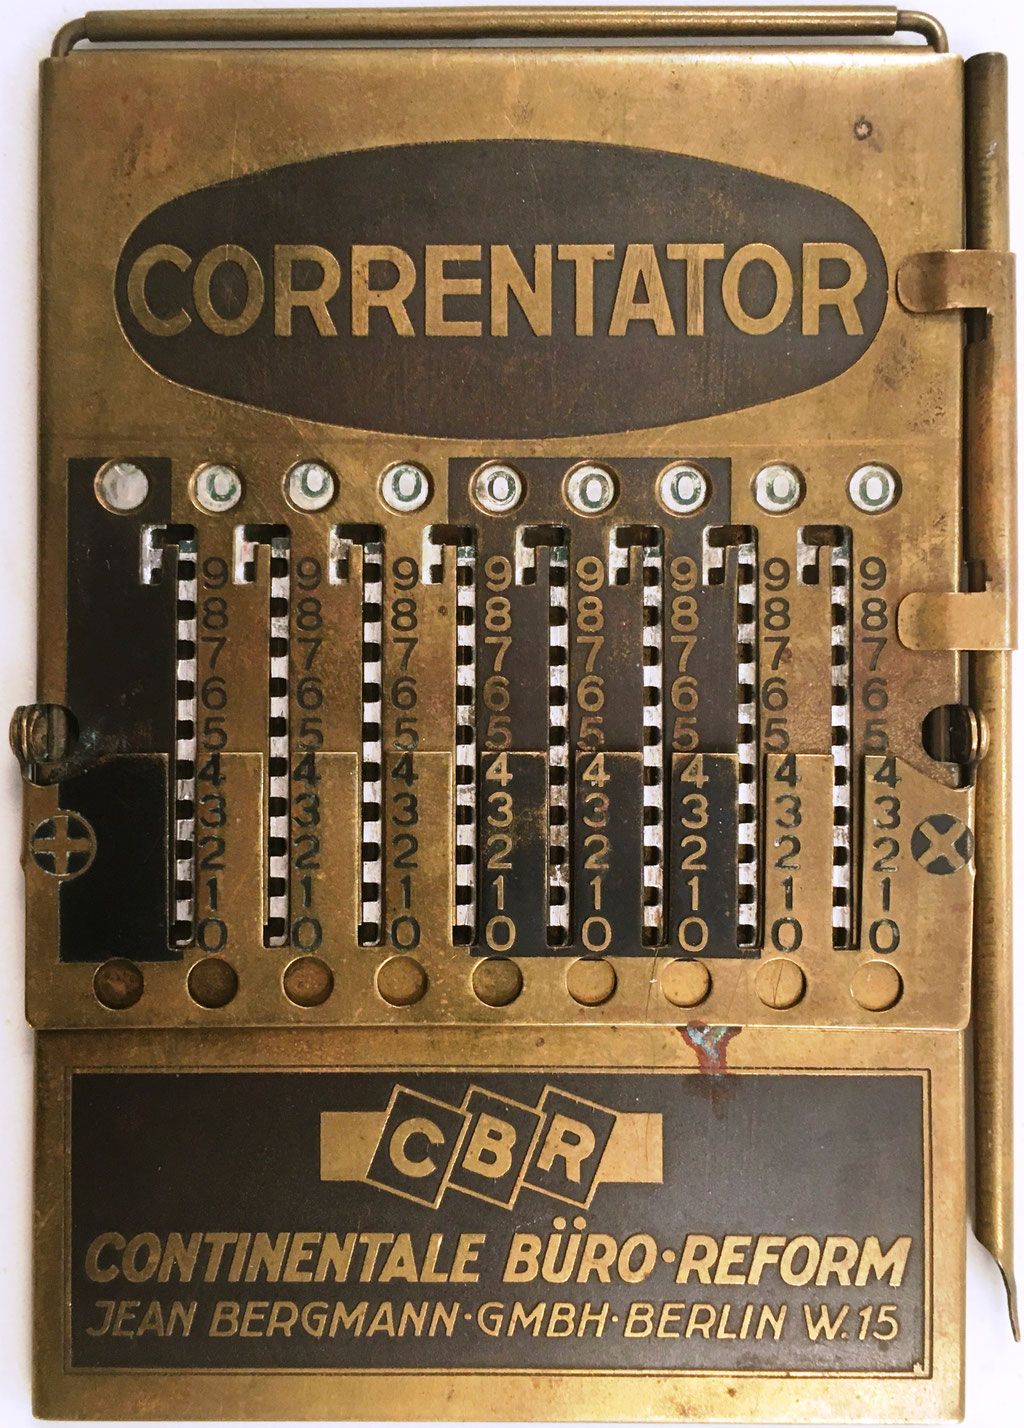 Ábaco de ranuras CORRENTATOR, CBR (Continentale Büro Reform), Jean Bergmann, Berlin, hacia 1923, 7x10.5 cm